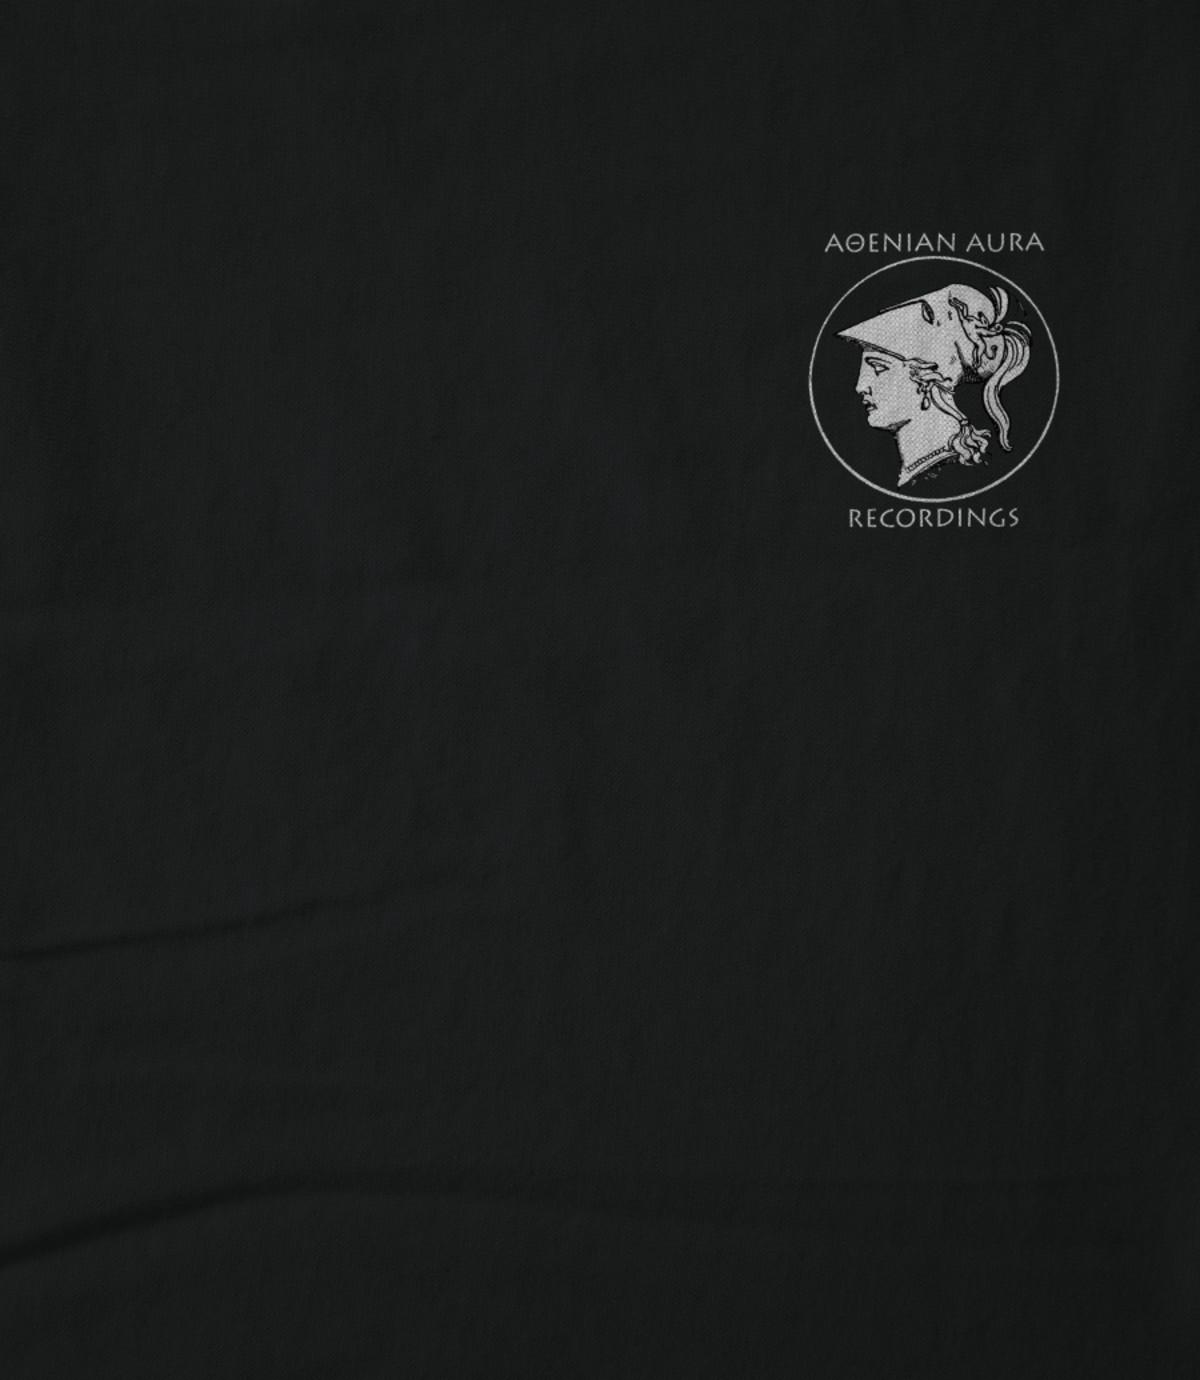 Athenian aura recordings athenian aura black 1501704122